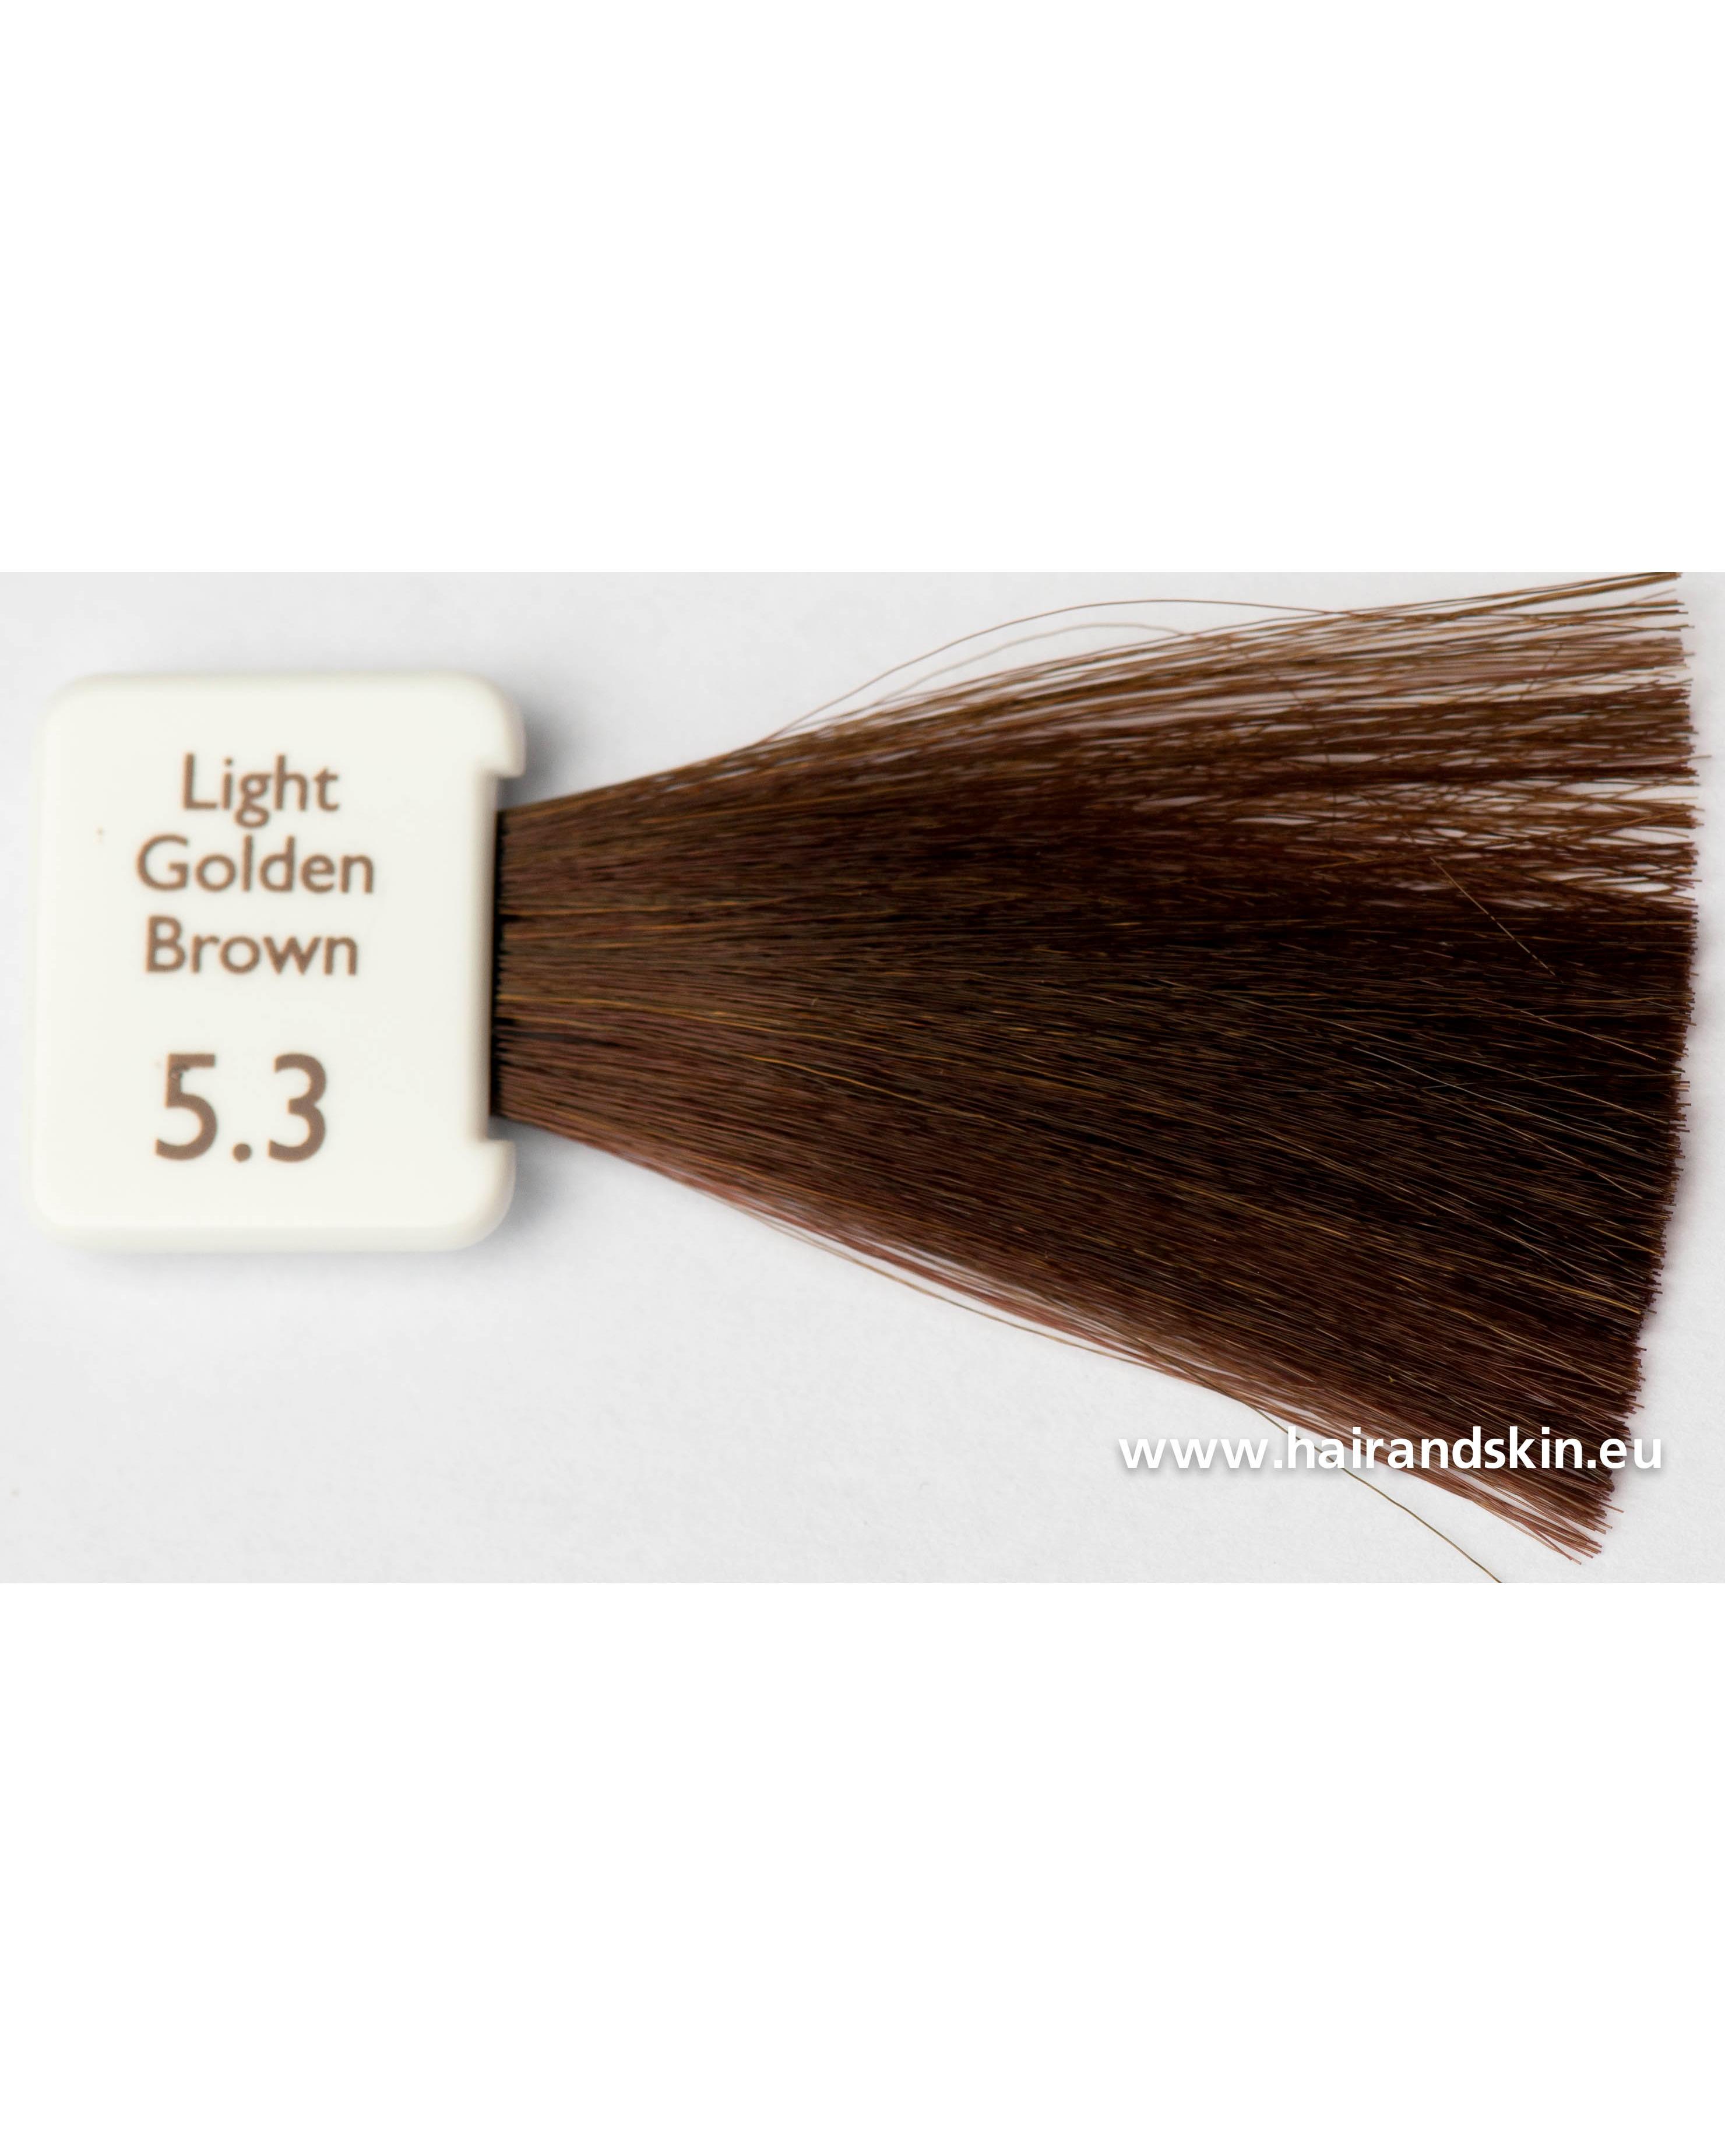 coloration natulique marron clair dor 5 3 cr me naturelle. Black Bedroom Furniture Sets. Home Design Ideas